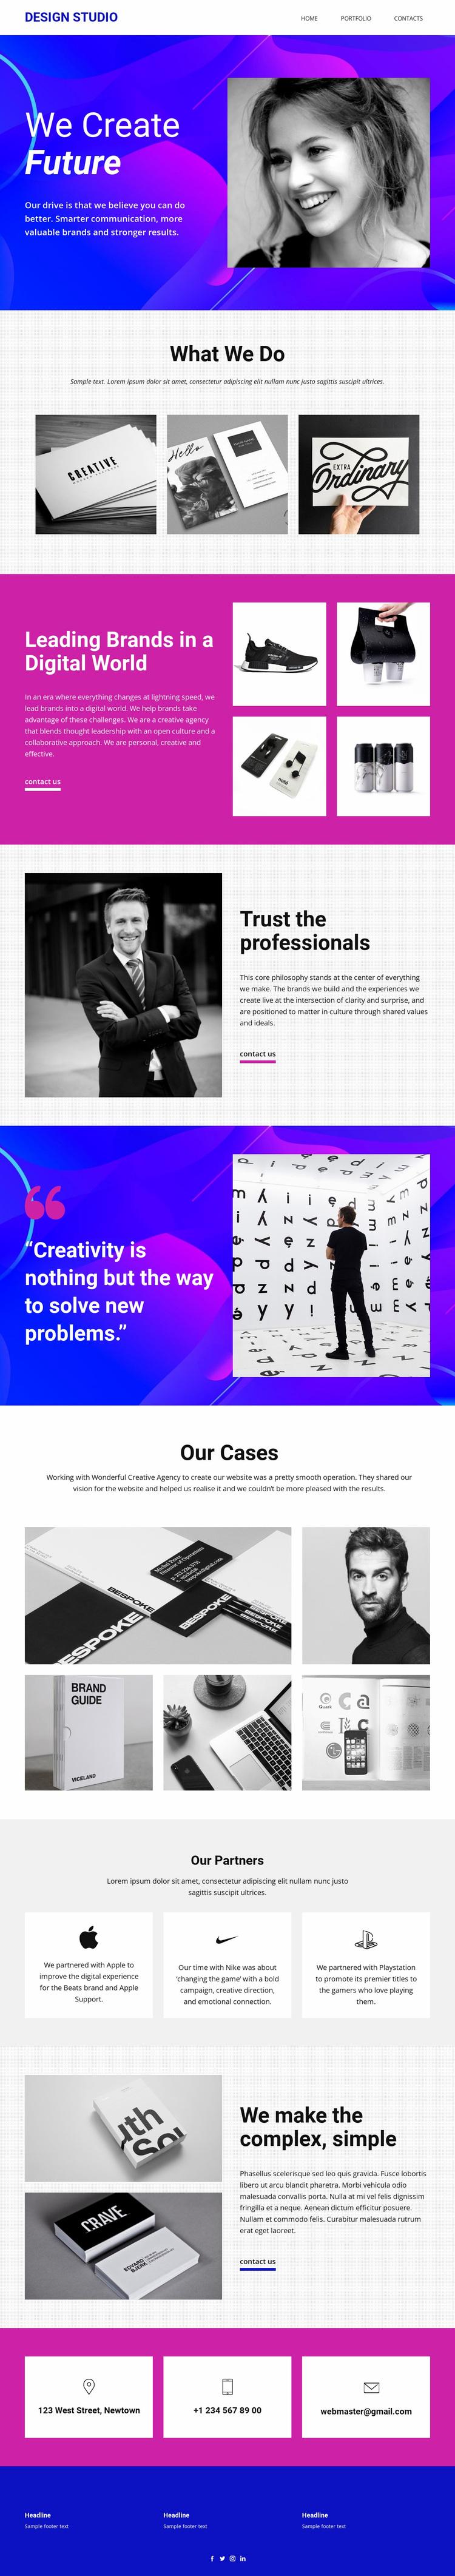 We develop the brand's core Website Design